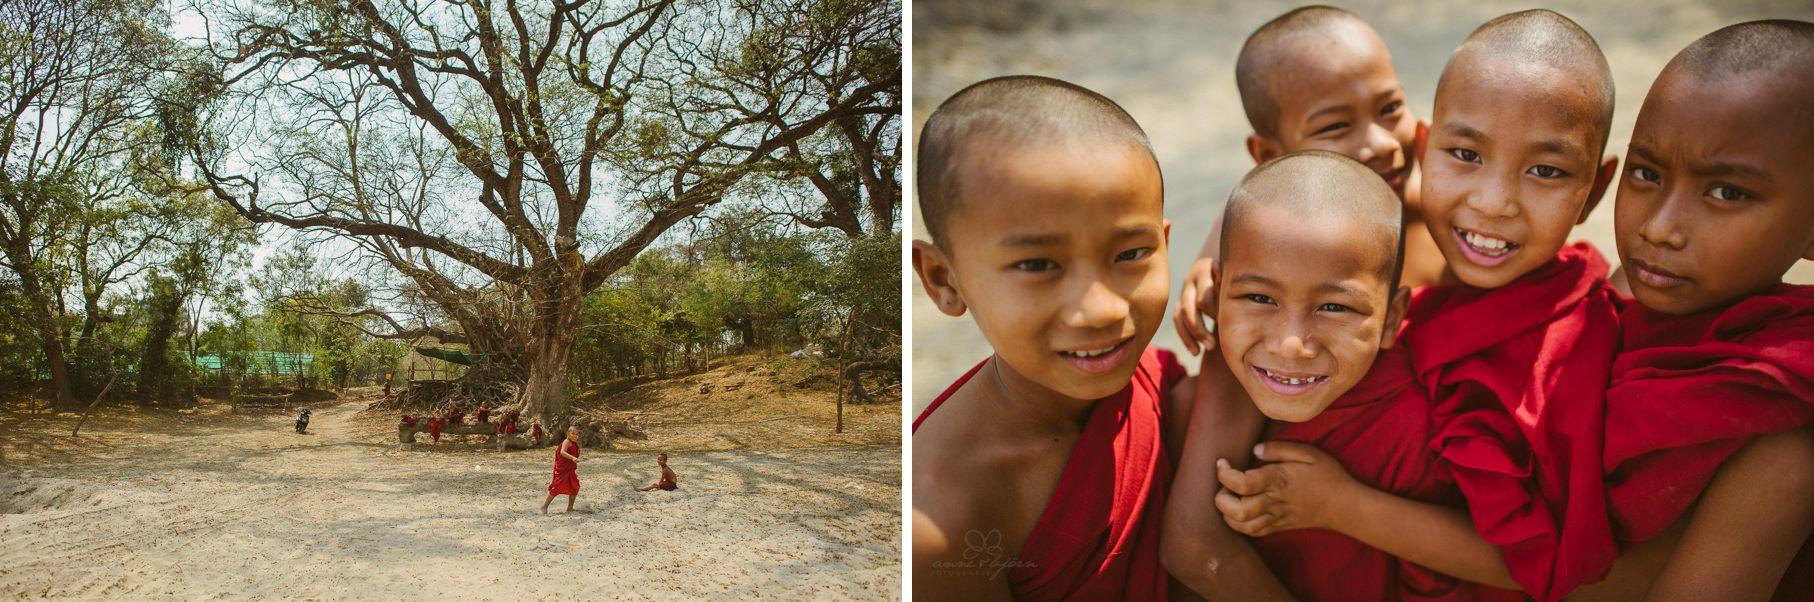 0019 bagan ngwesaung d76 7825 1 - Tempelstadt Bagan & tauchen am Ngwesaungbeach